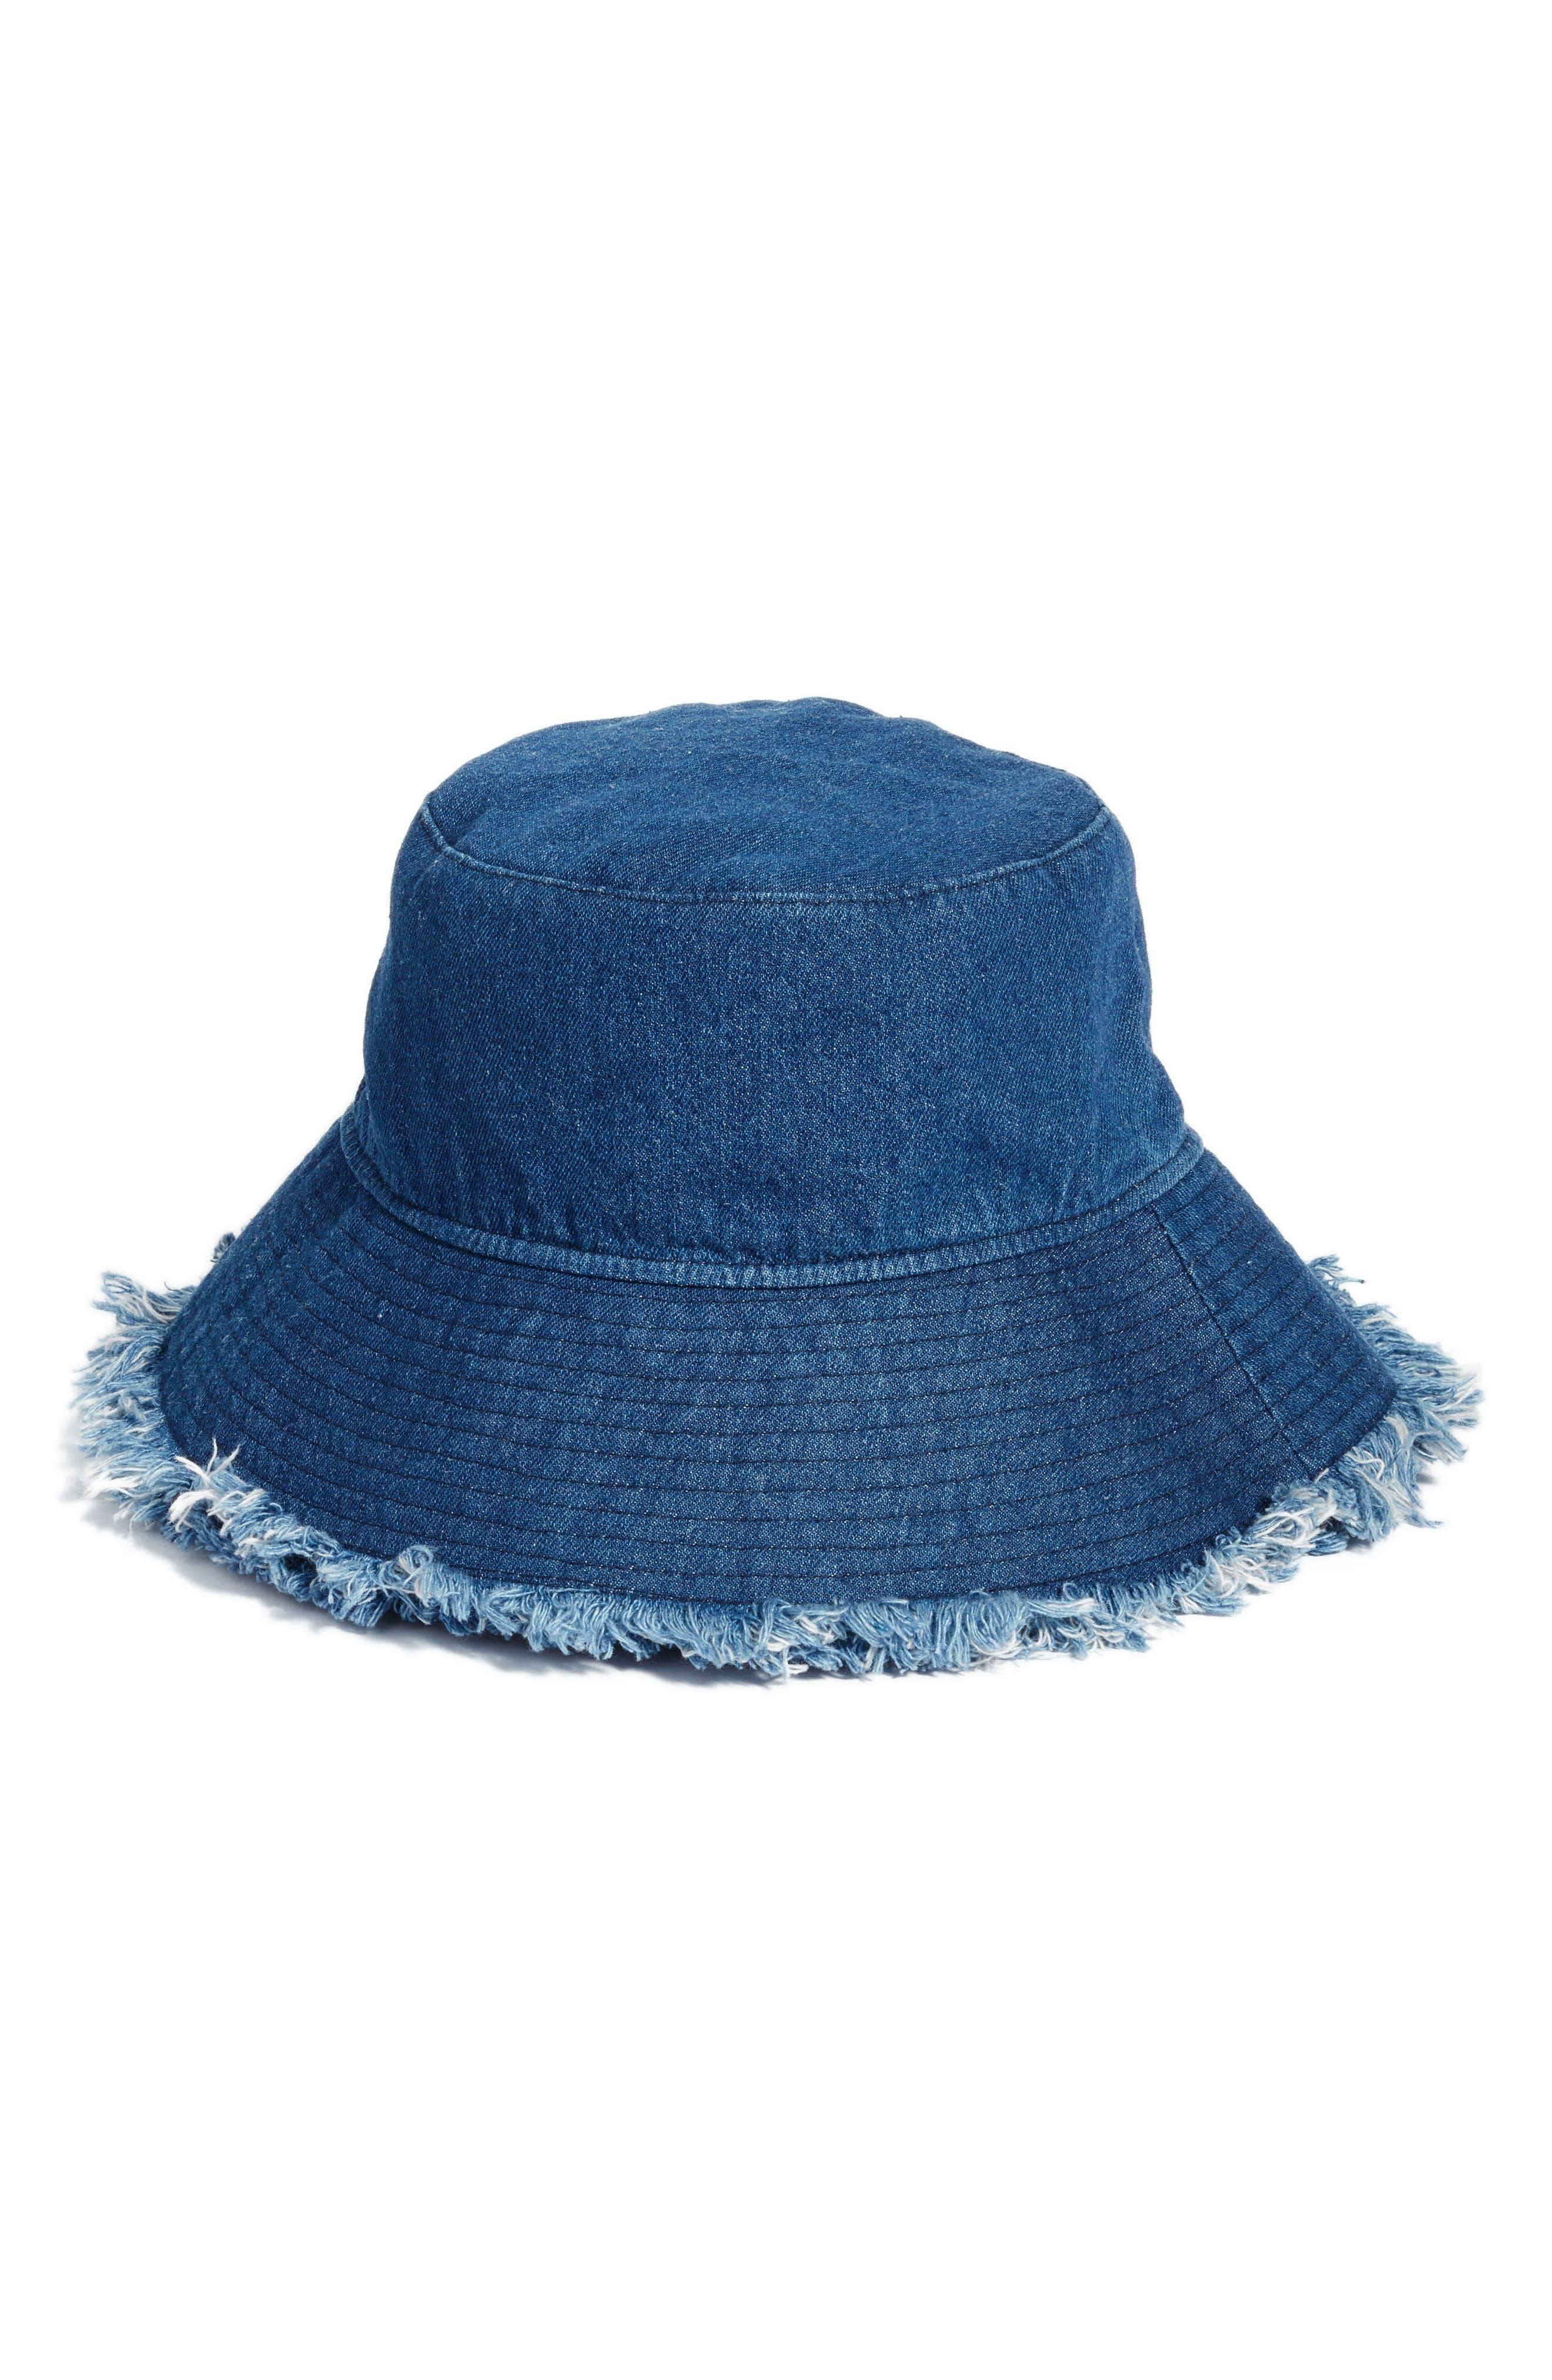 Main Image - Trasure & Bond Denim Bucket Hat